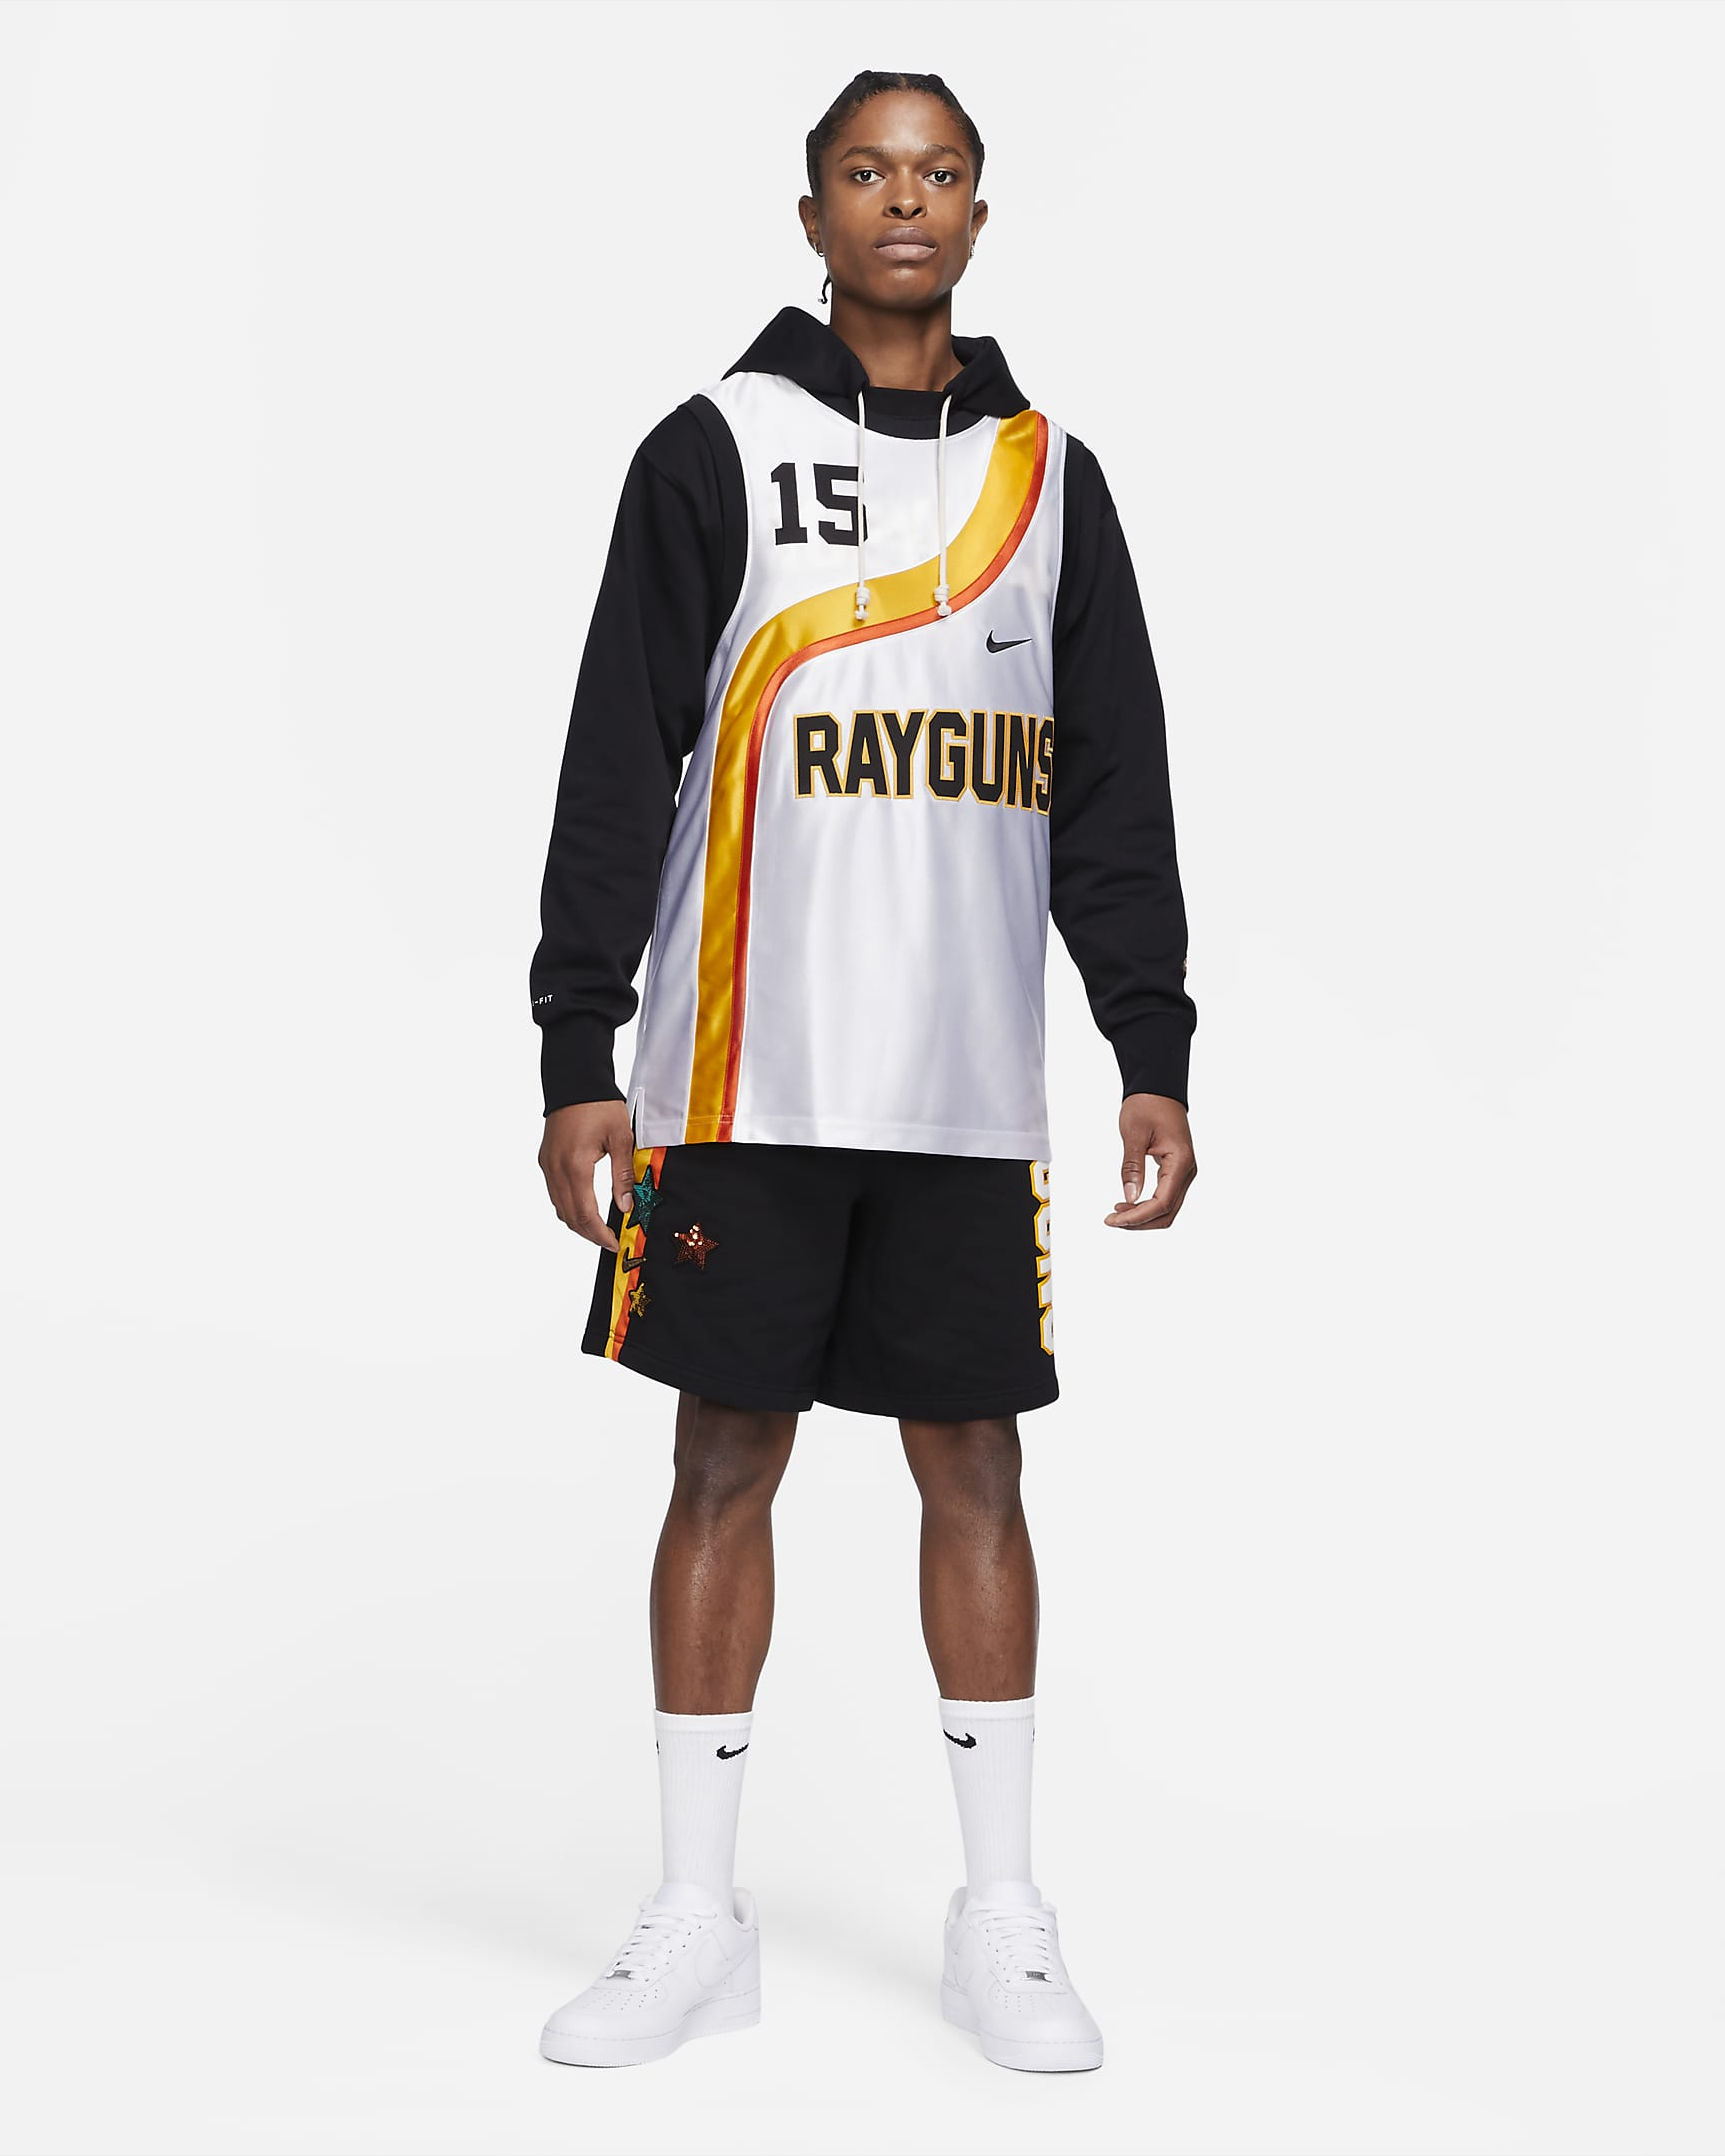 rayguns-mens-premium-basketball-jersey-mqcFDS-5